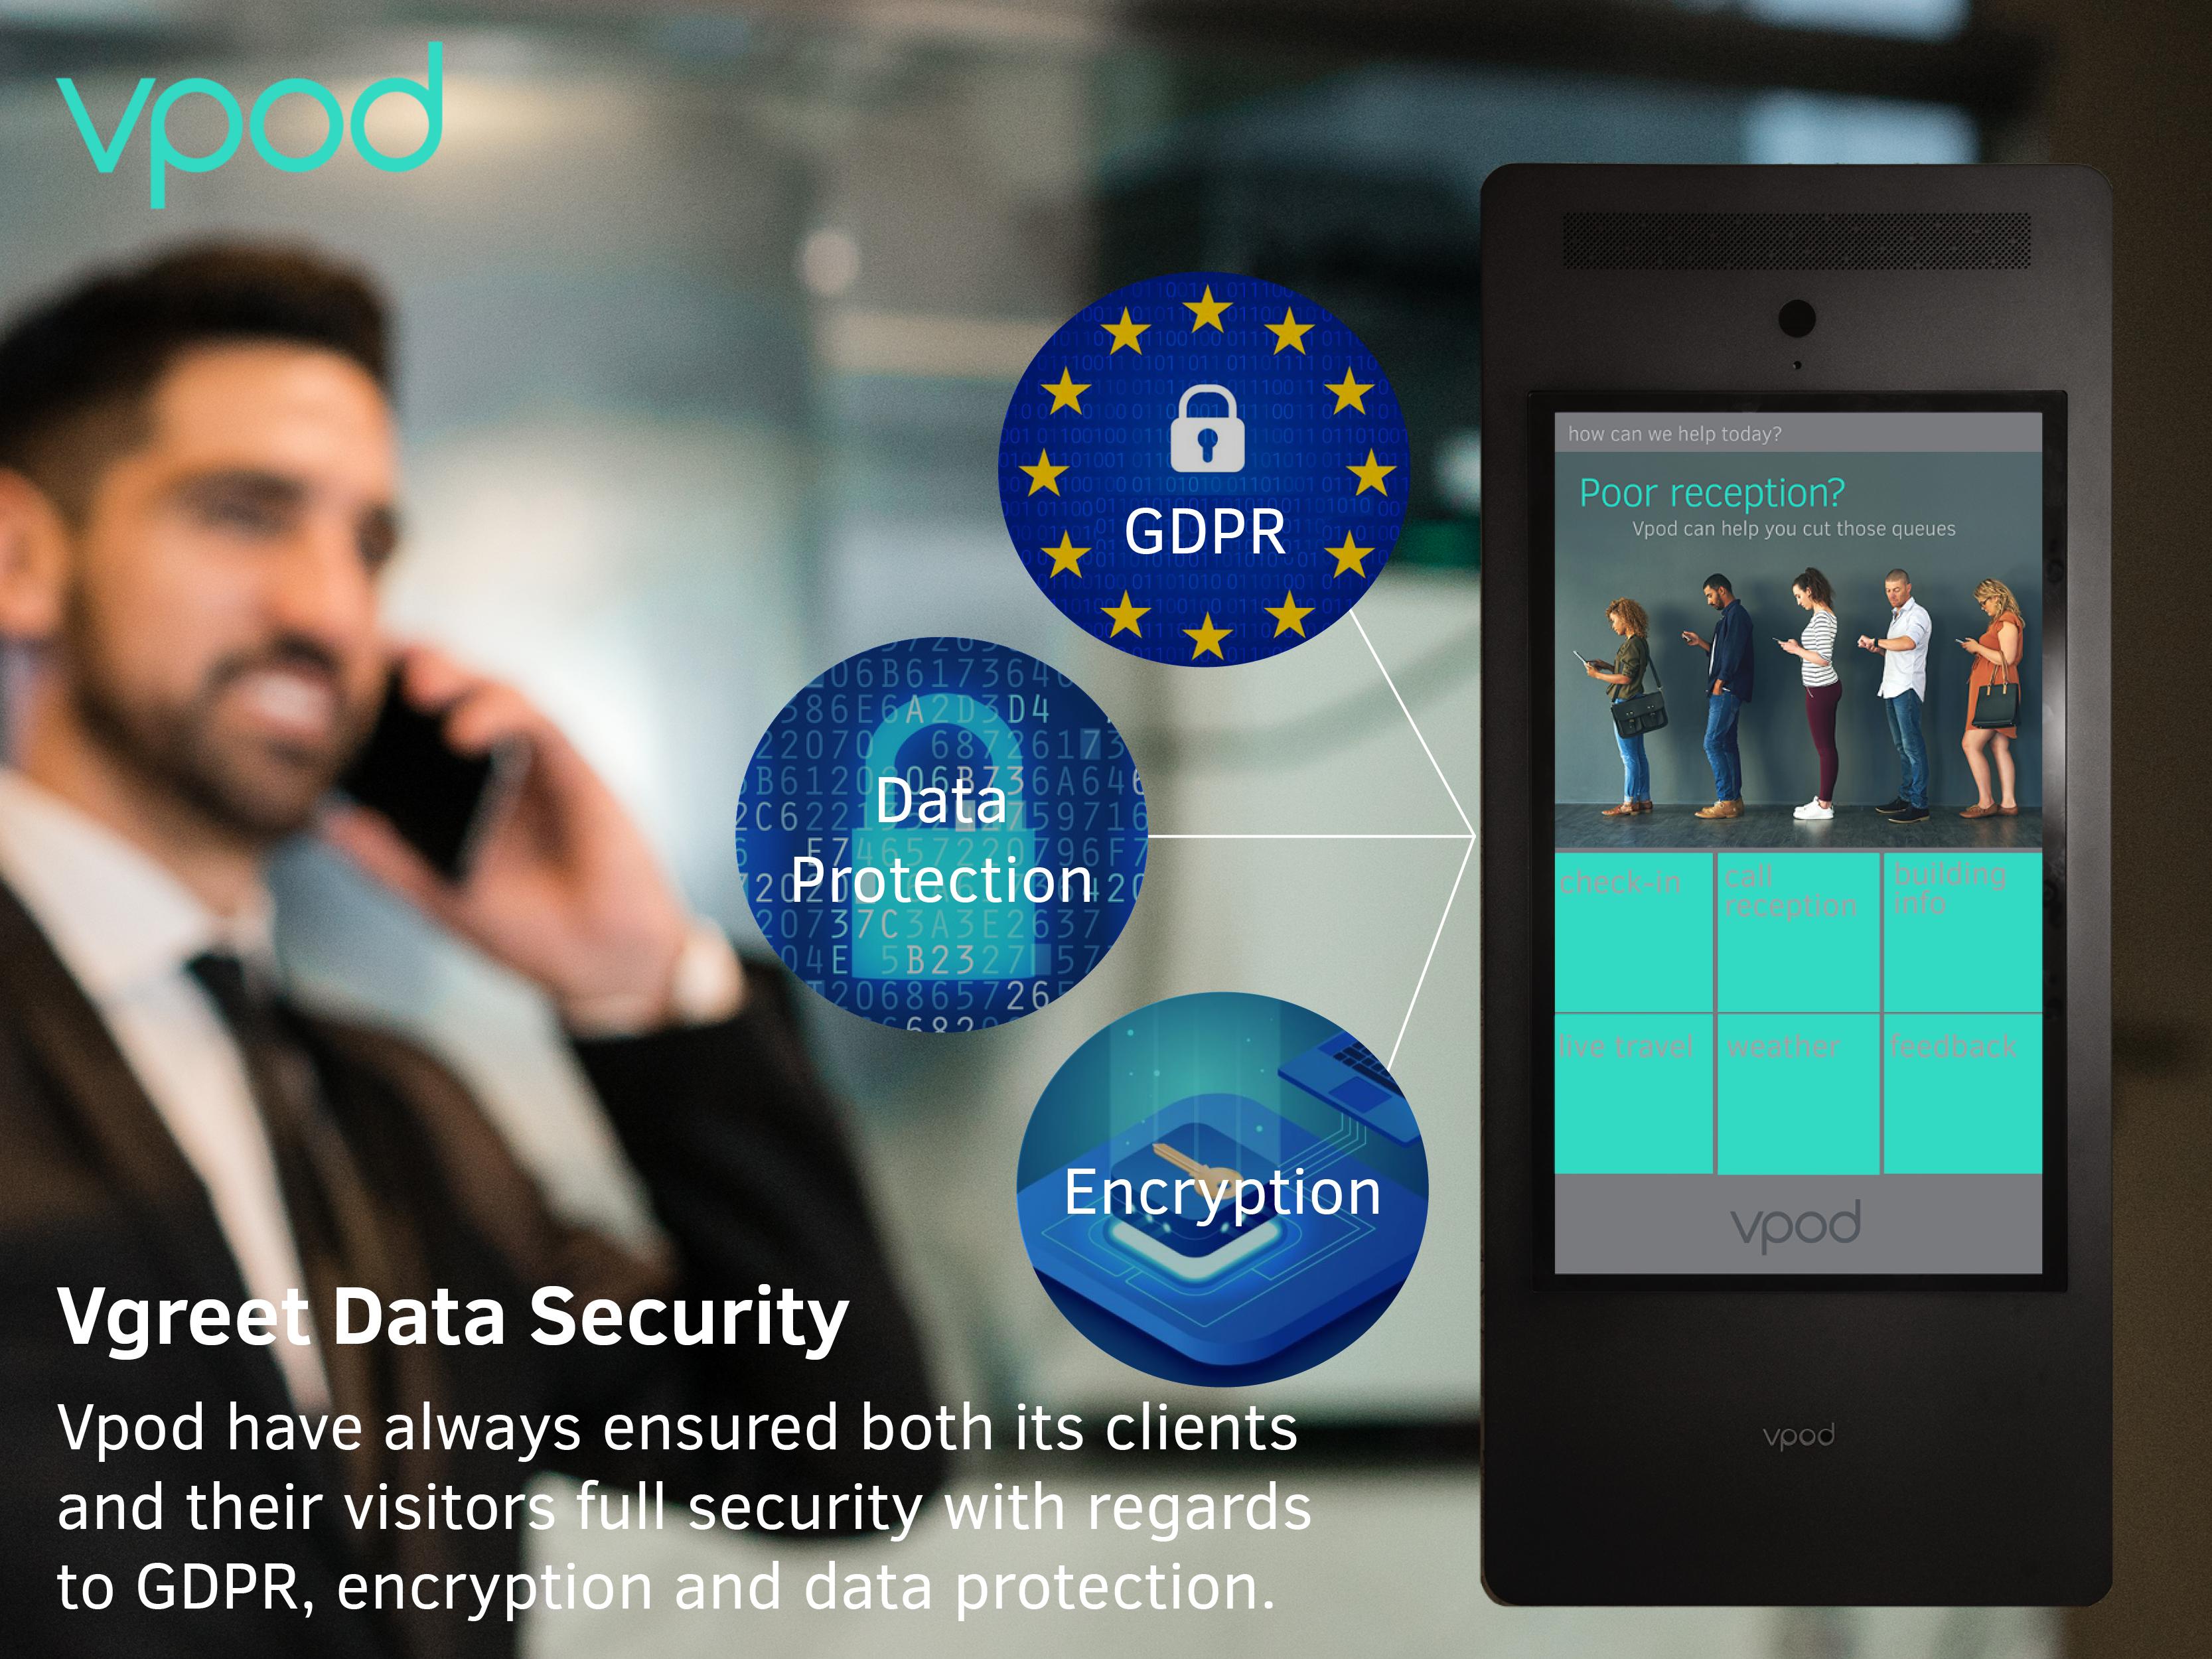 vgreet_data_security